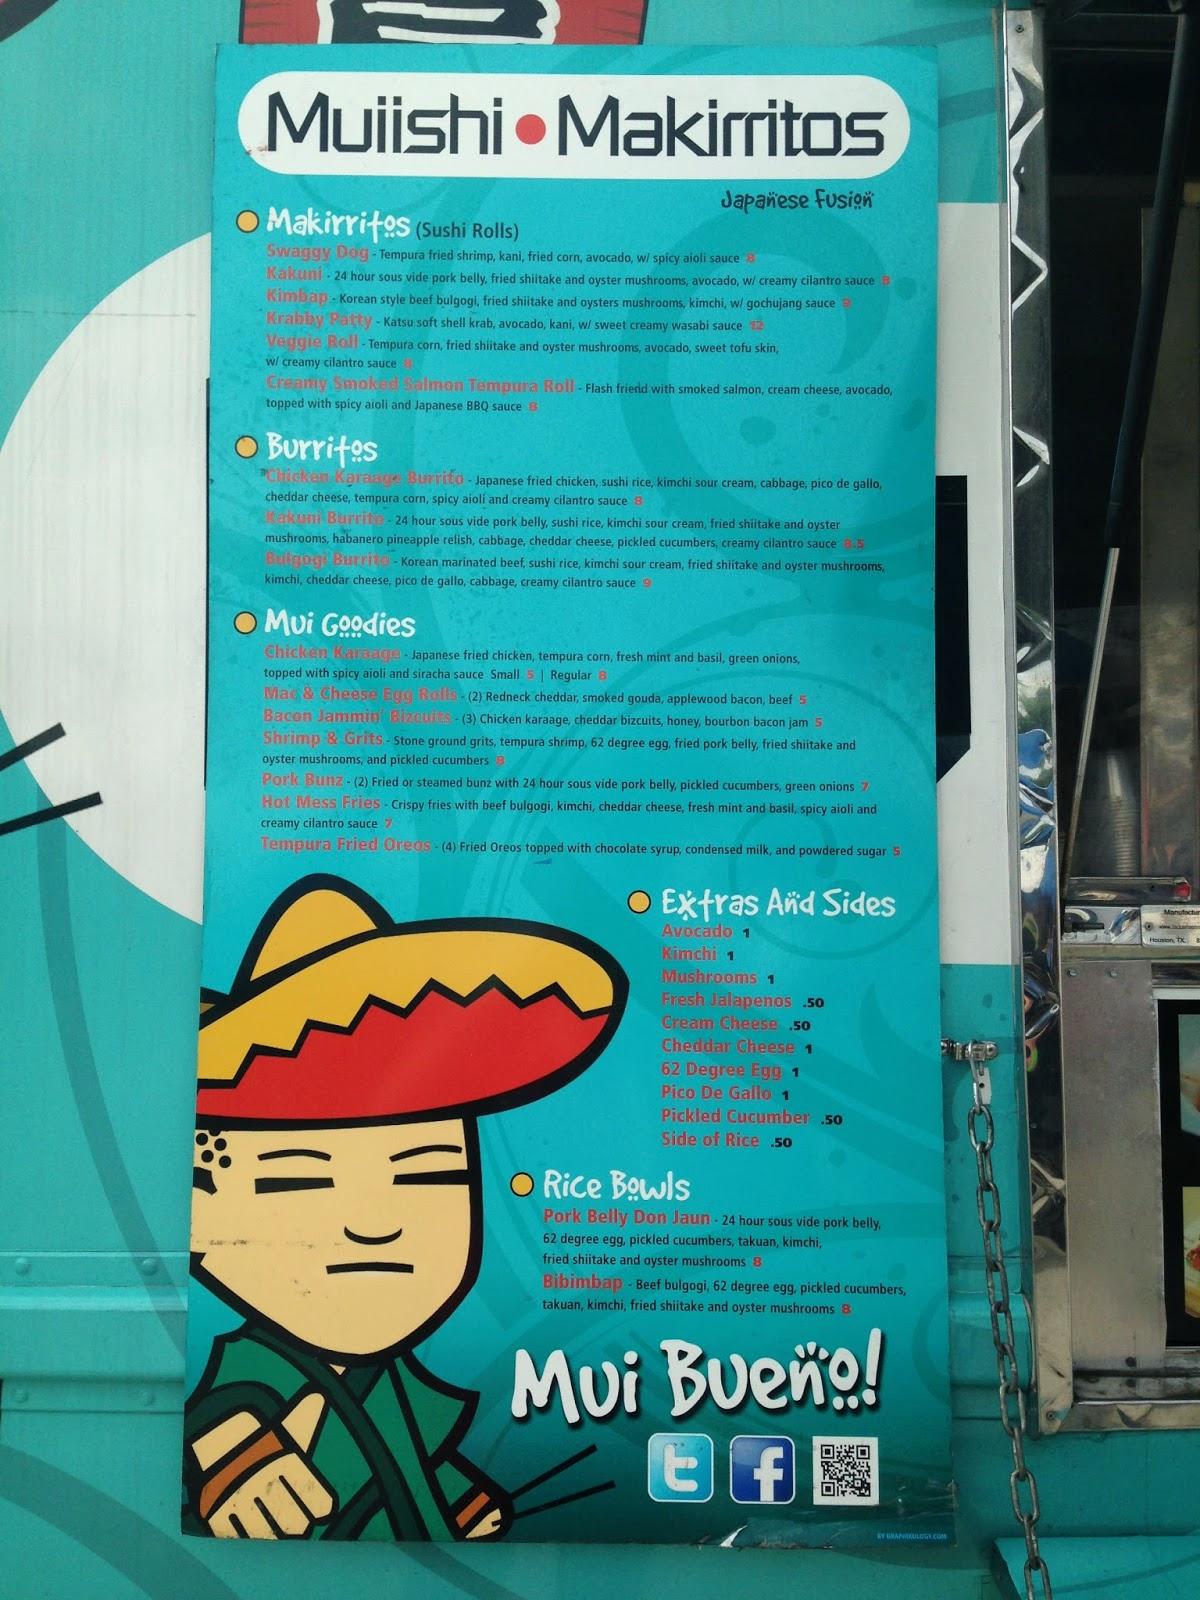 Muiishi Food Truck Menu